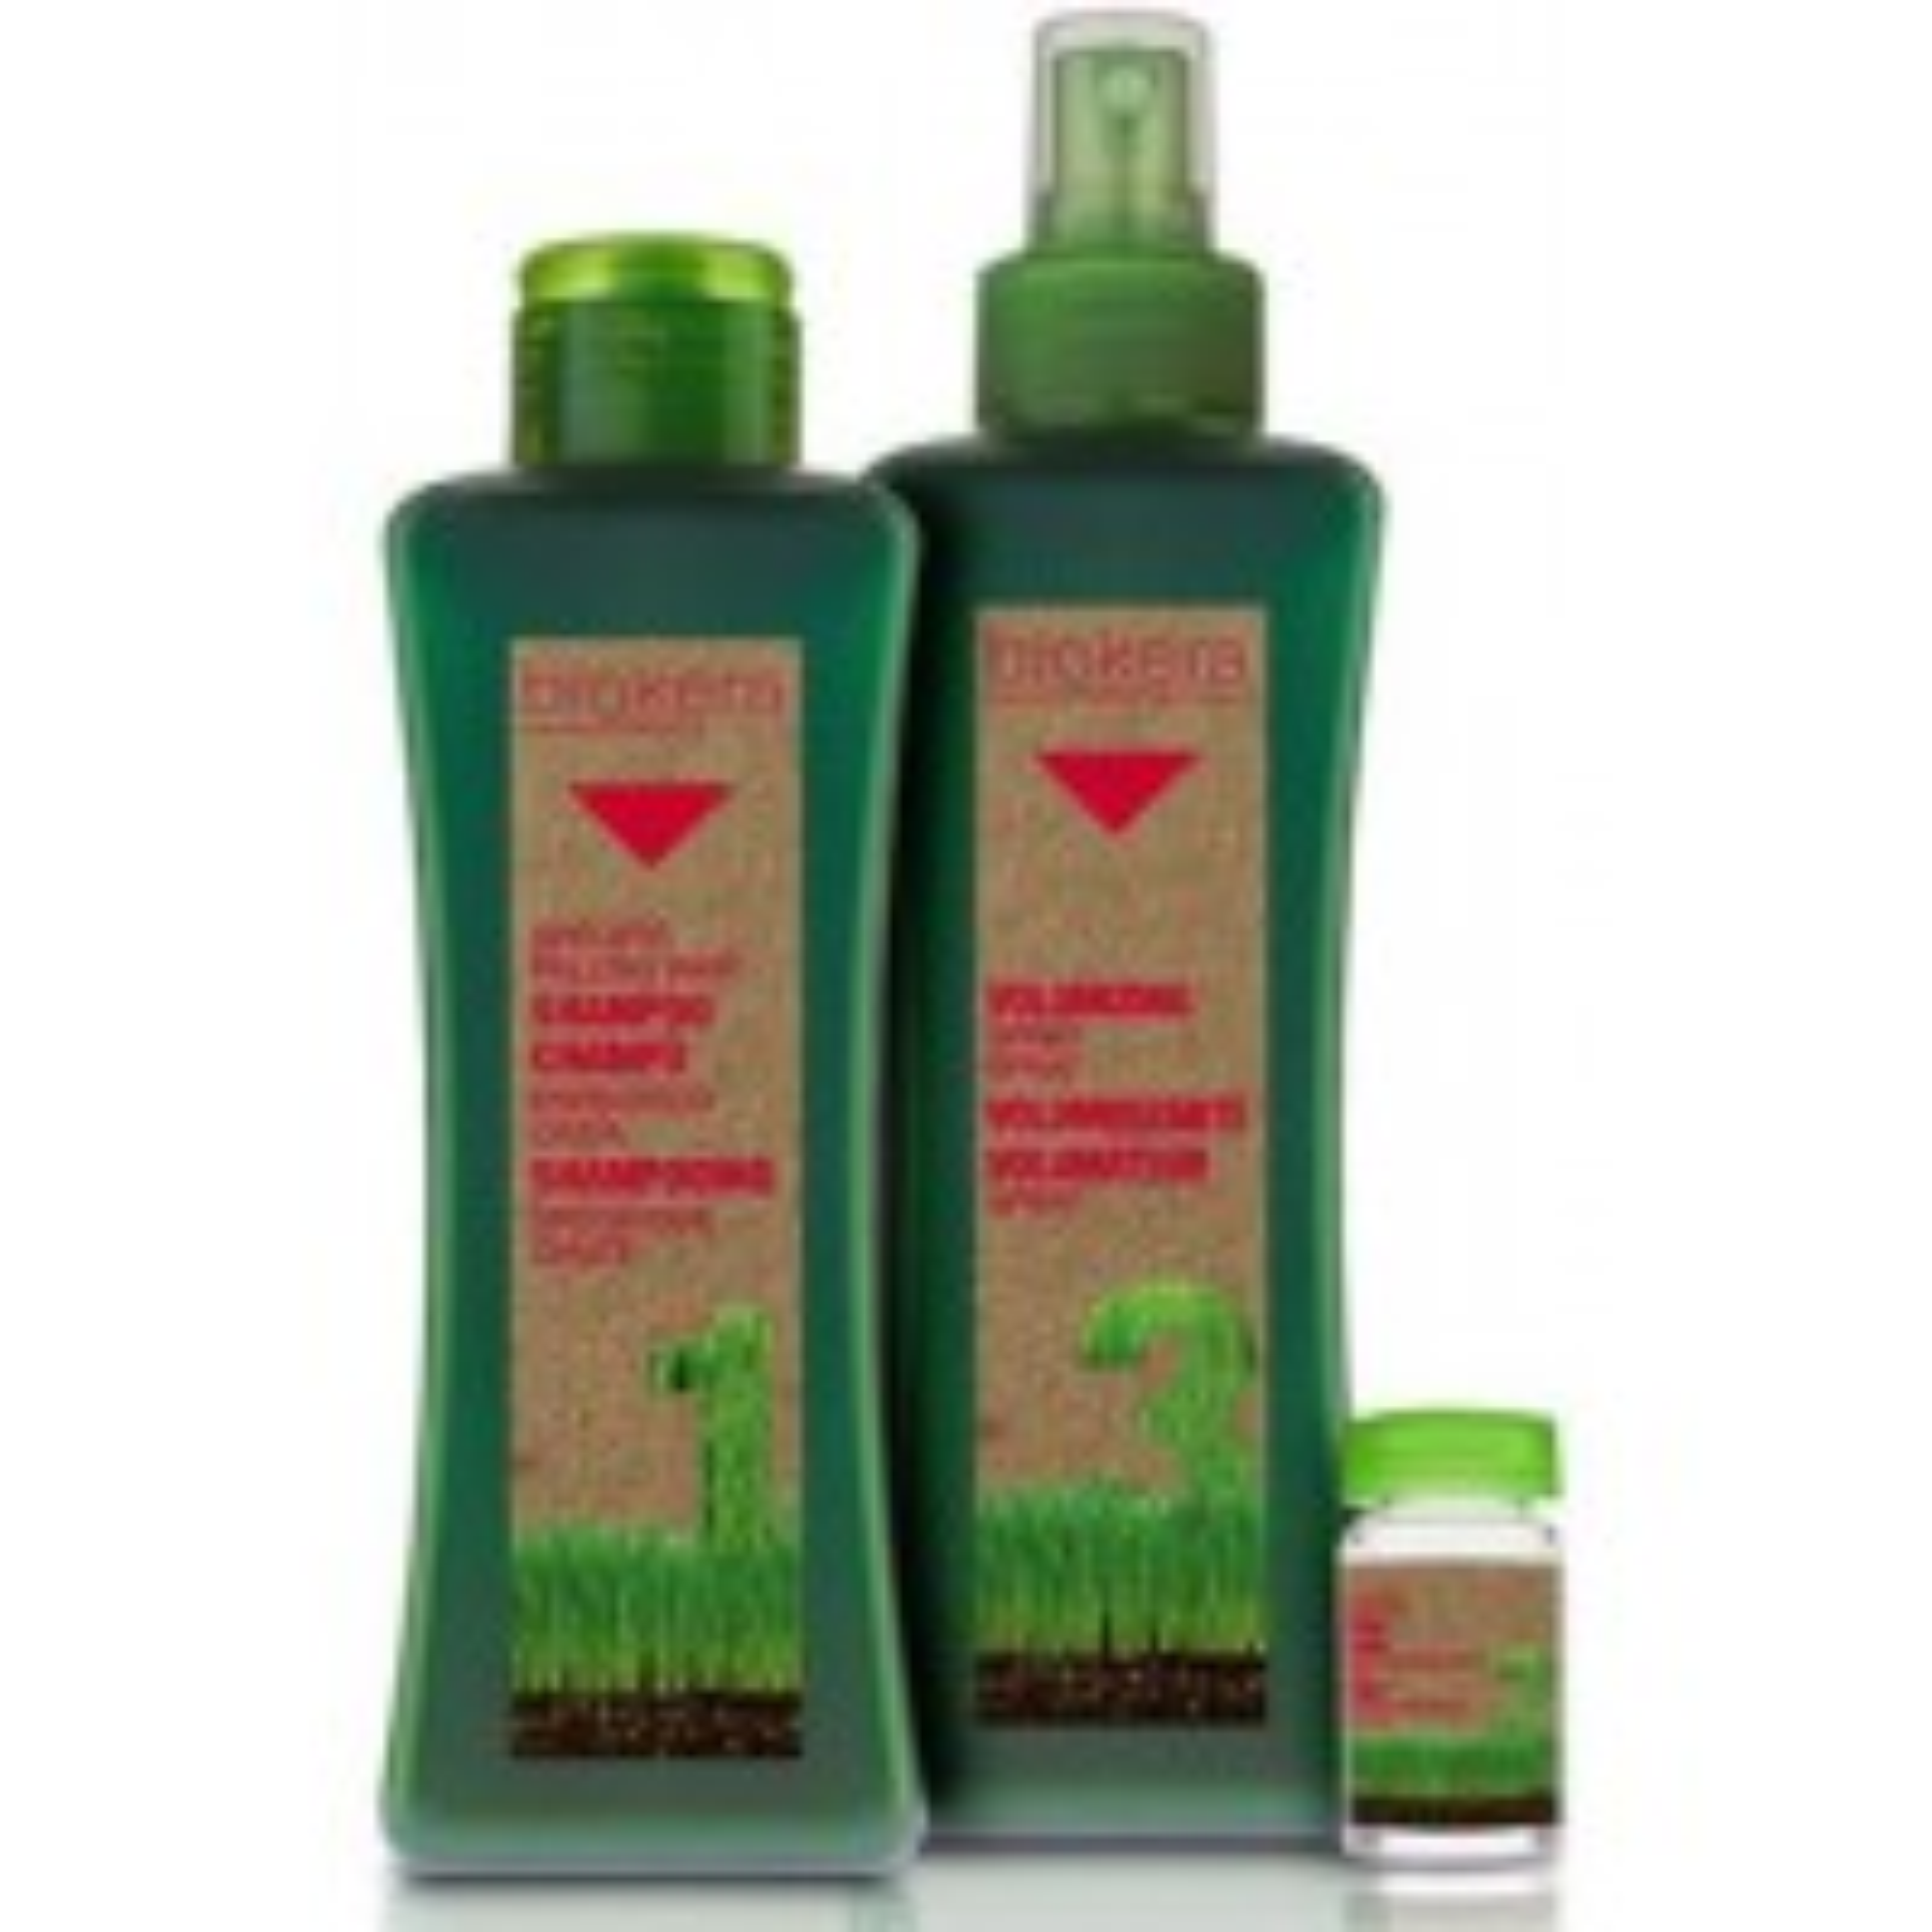 Salerm Cosmetics - Biokera Lozione Intensiva Anticaduta